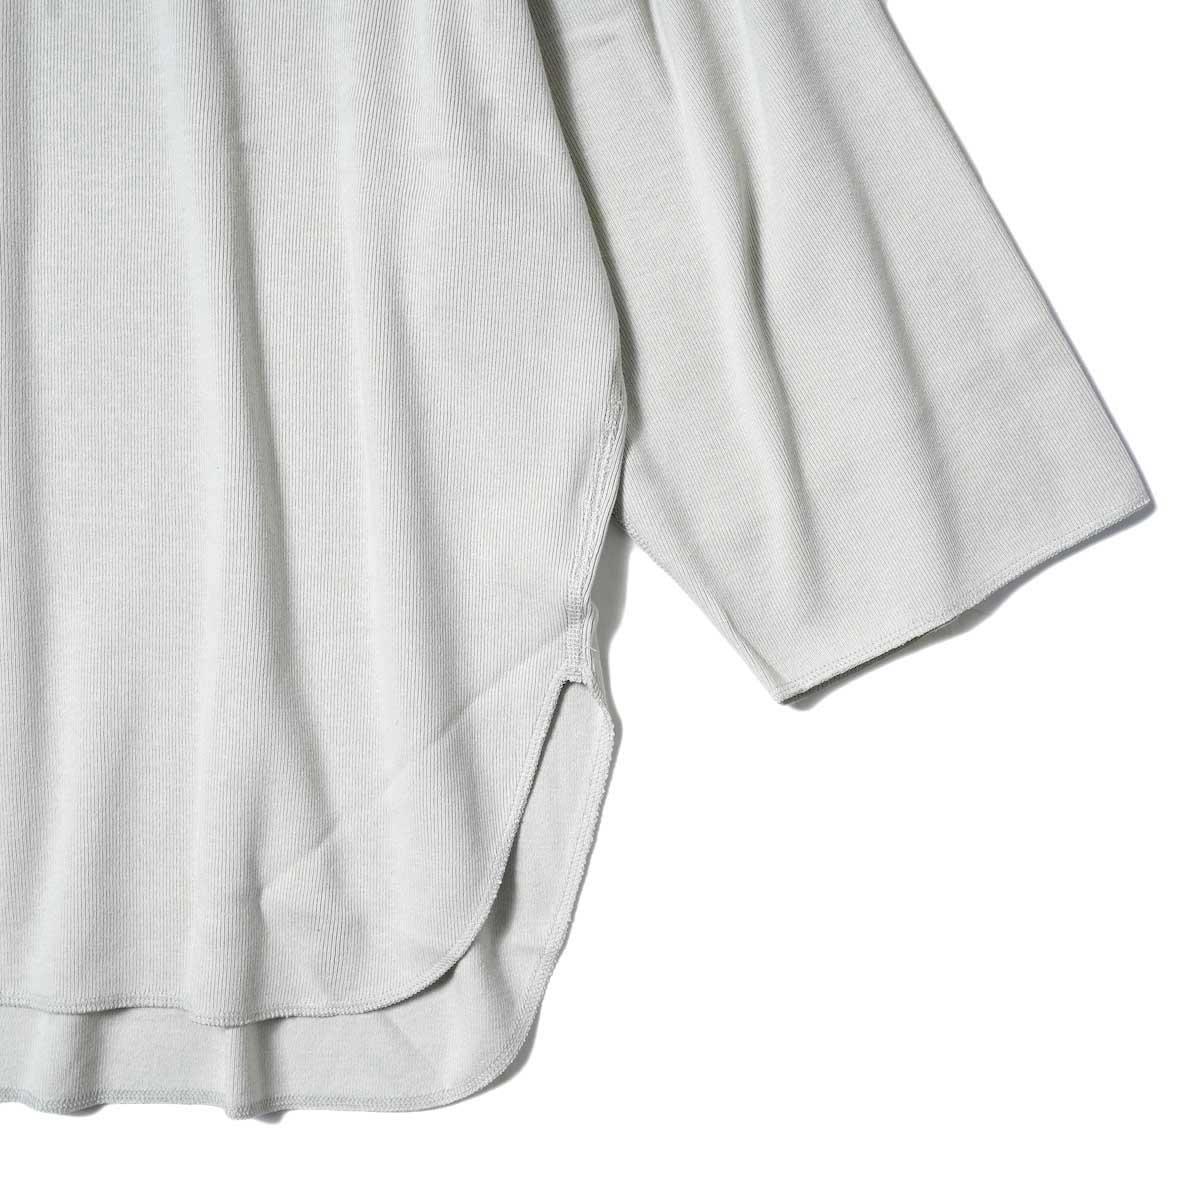 YLEVE / CTN RIB P/O BIG (Beige) 袖・裾